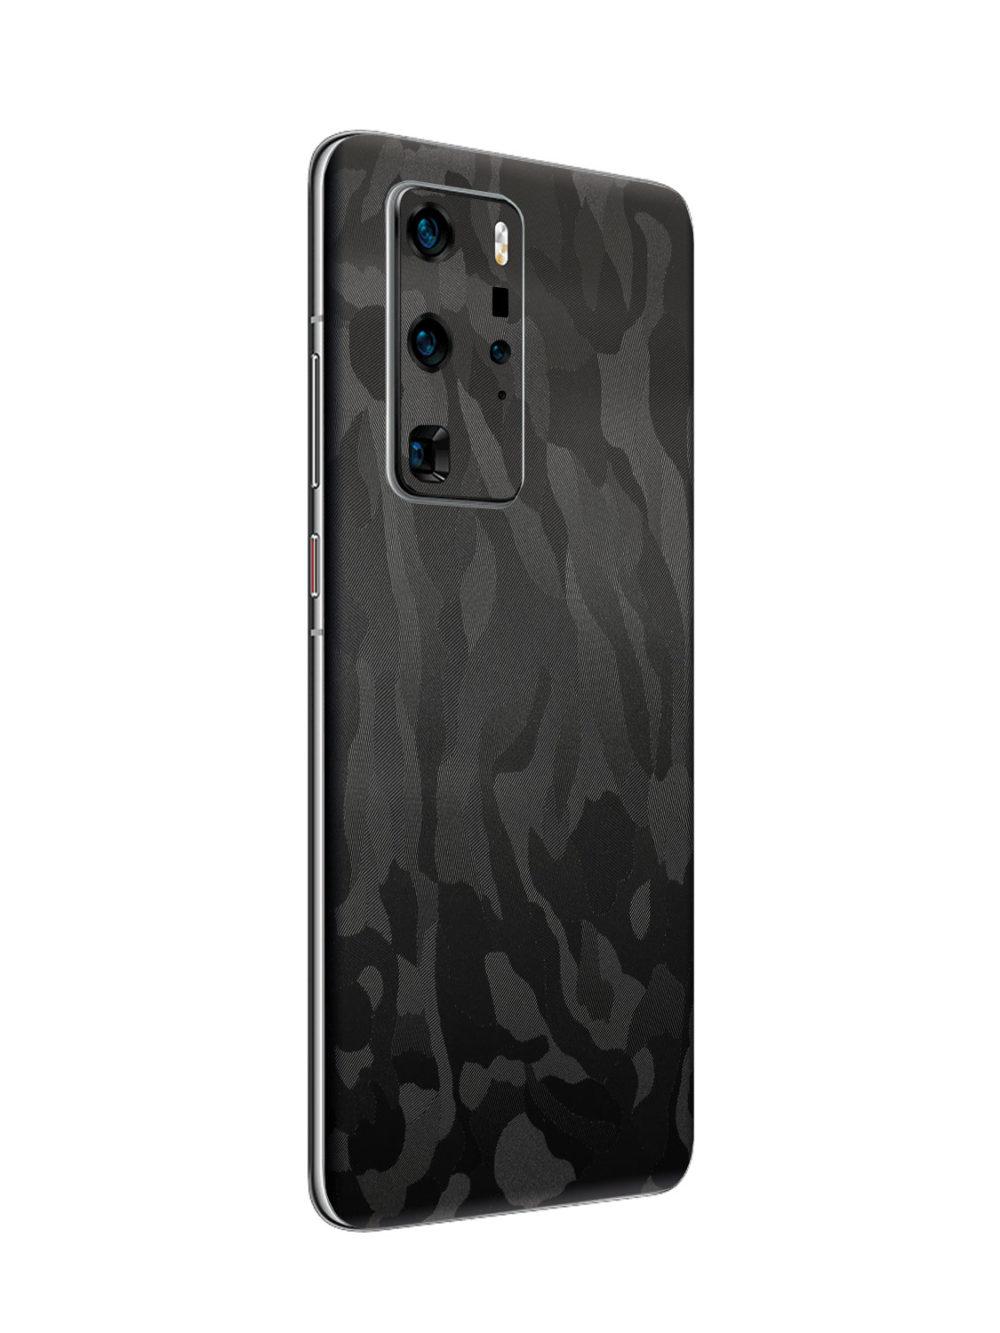 Black Camo Vinyl Skin for Huawei P40 Pro